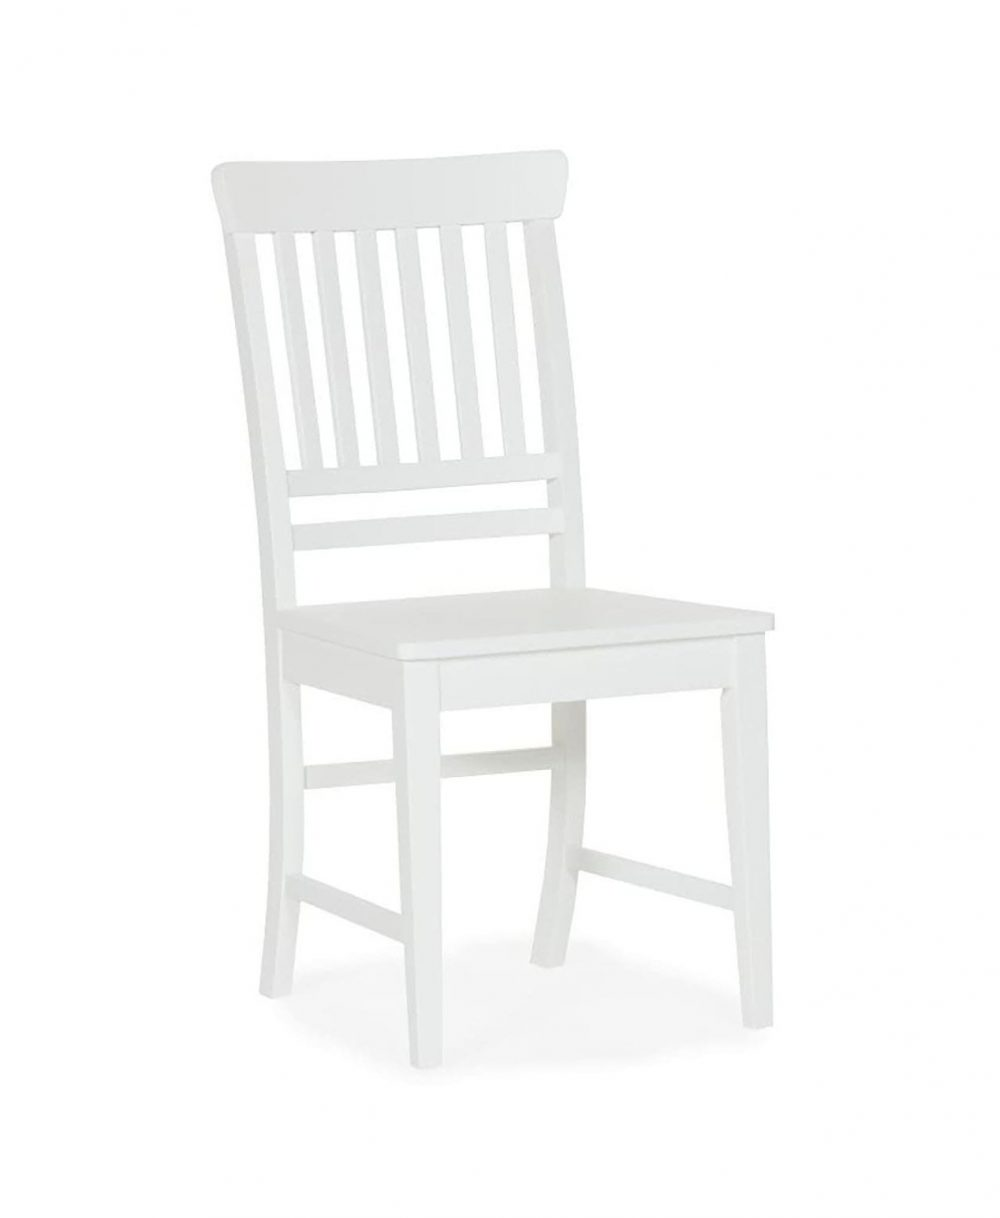 Visingso Chair